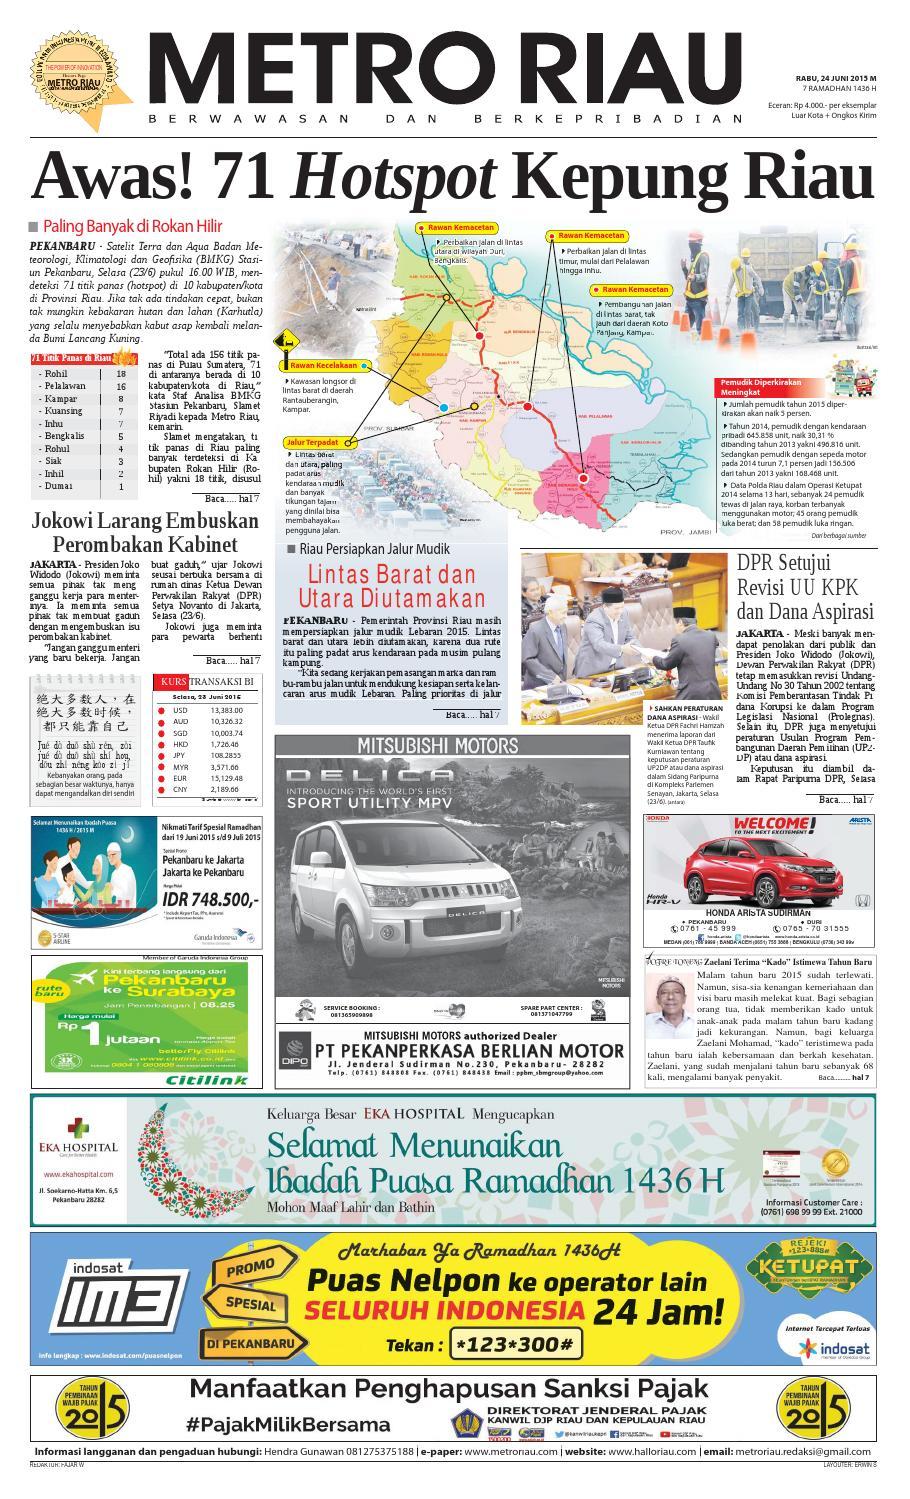 24062015 By Harian Pagi Metro Riau Issuu Produk Ukm Bumn Kain Batik Middle Premium Sutera